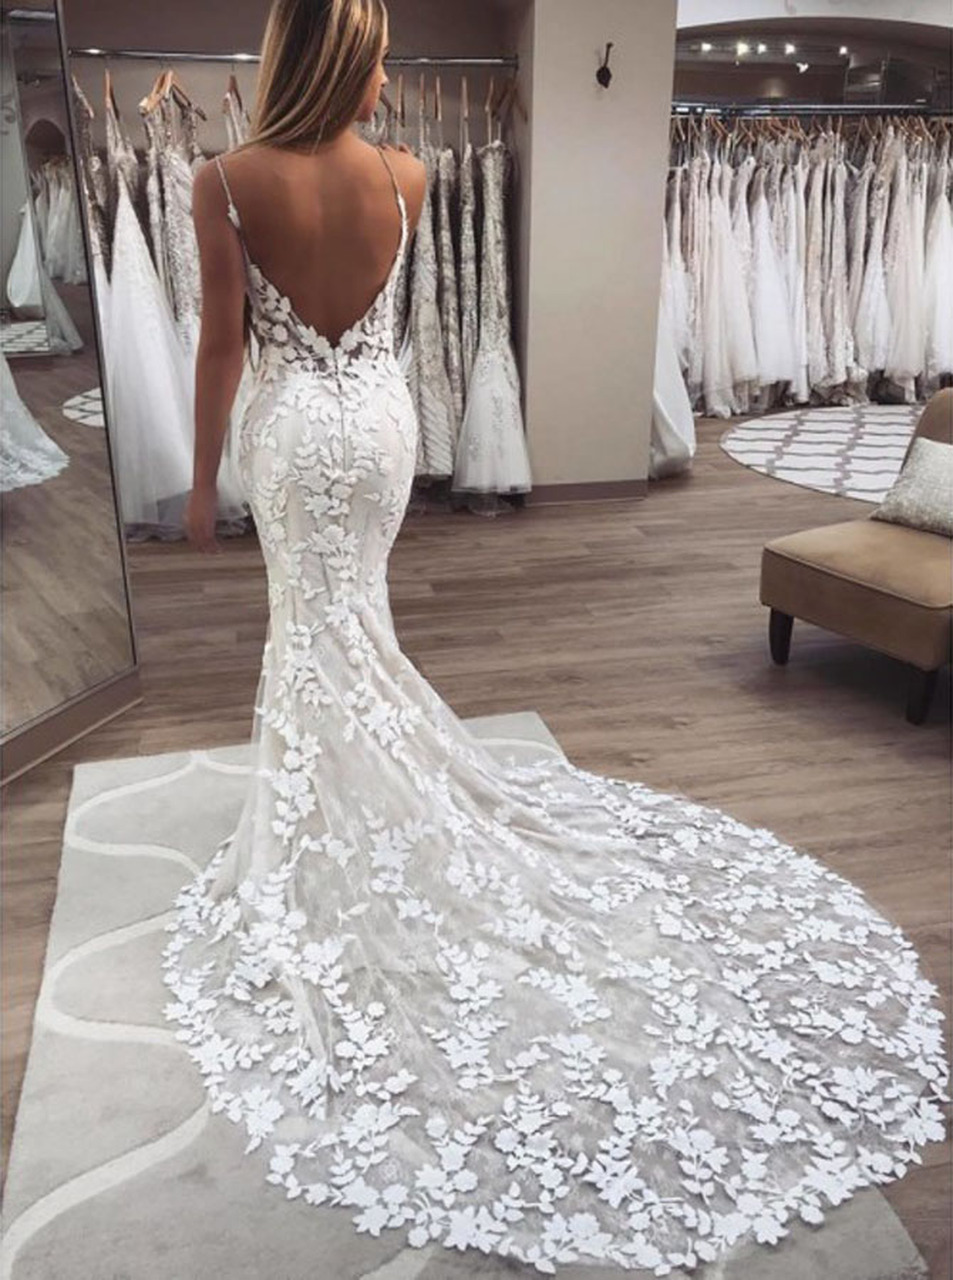 Lace Mermaid Wedding Dress with Spaghetti Straps,Destination Wedding  Dress,18